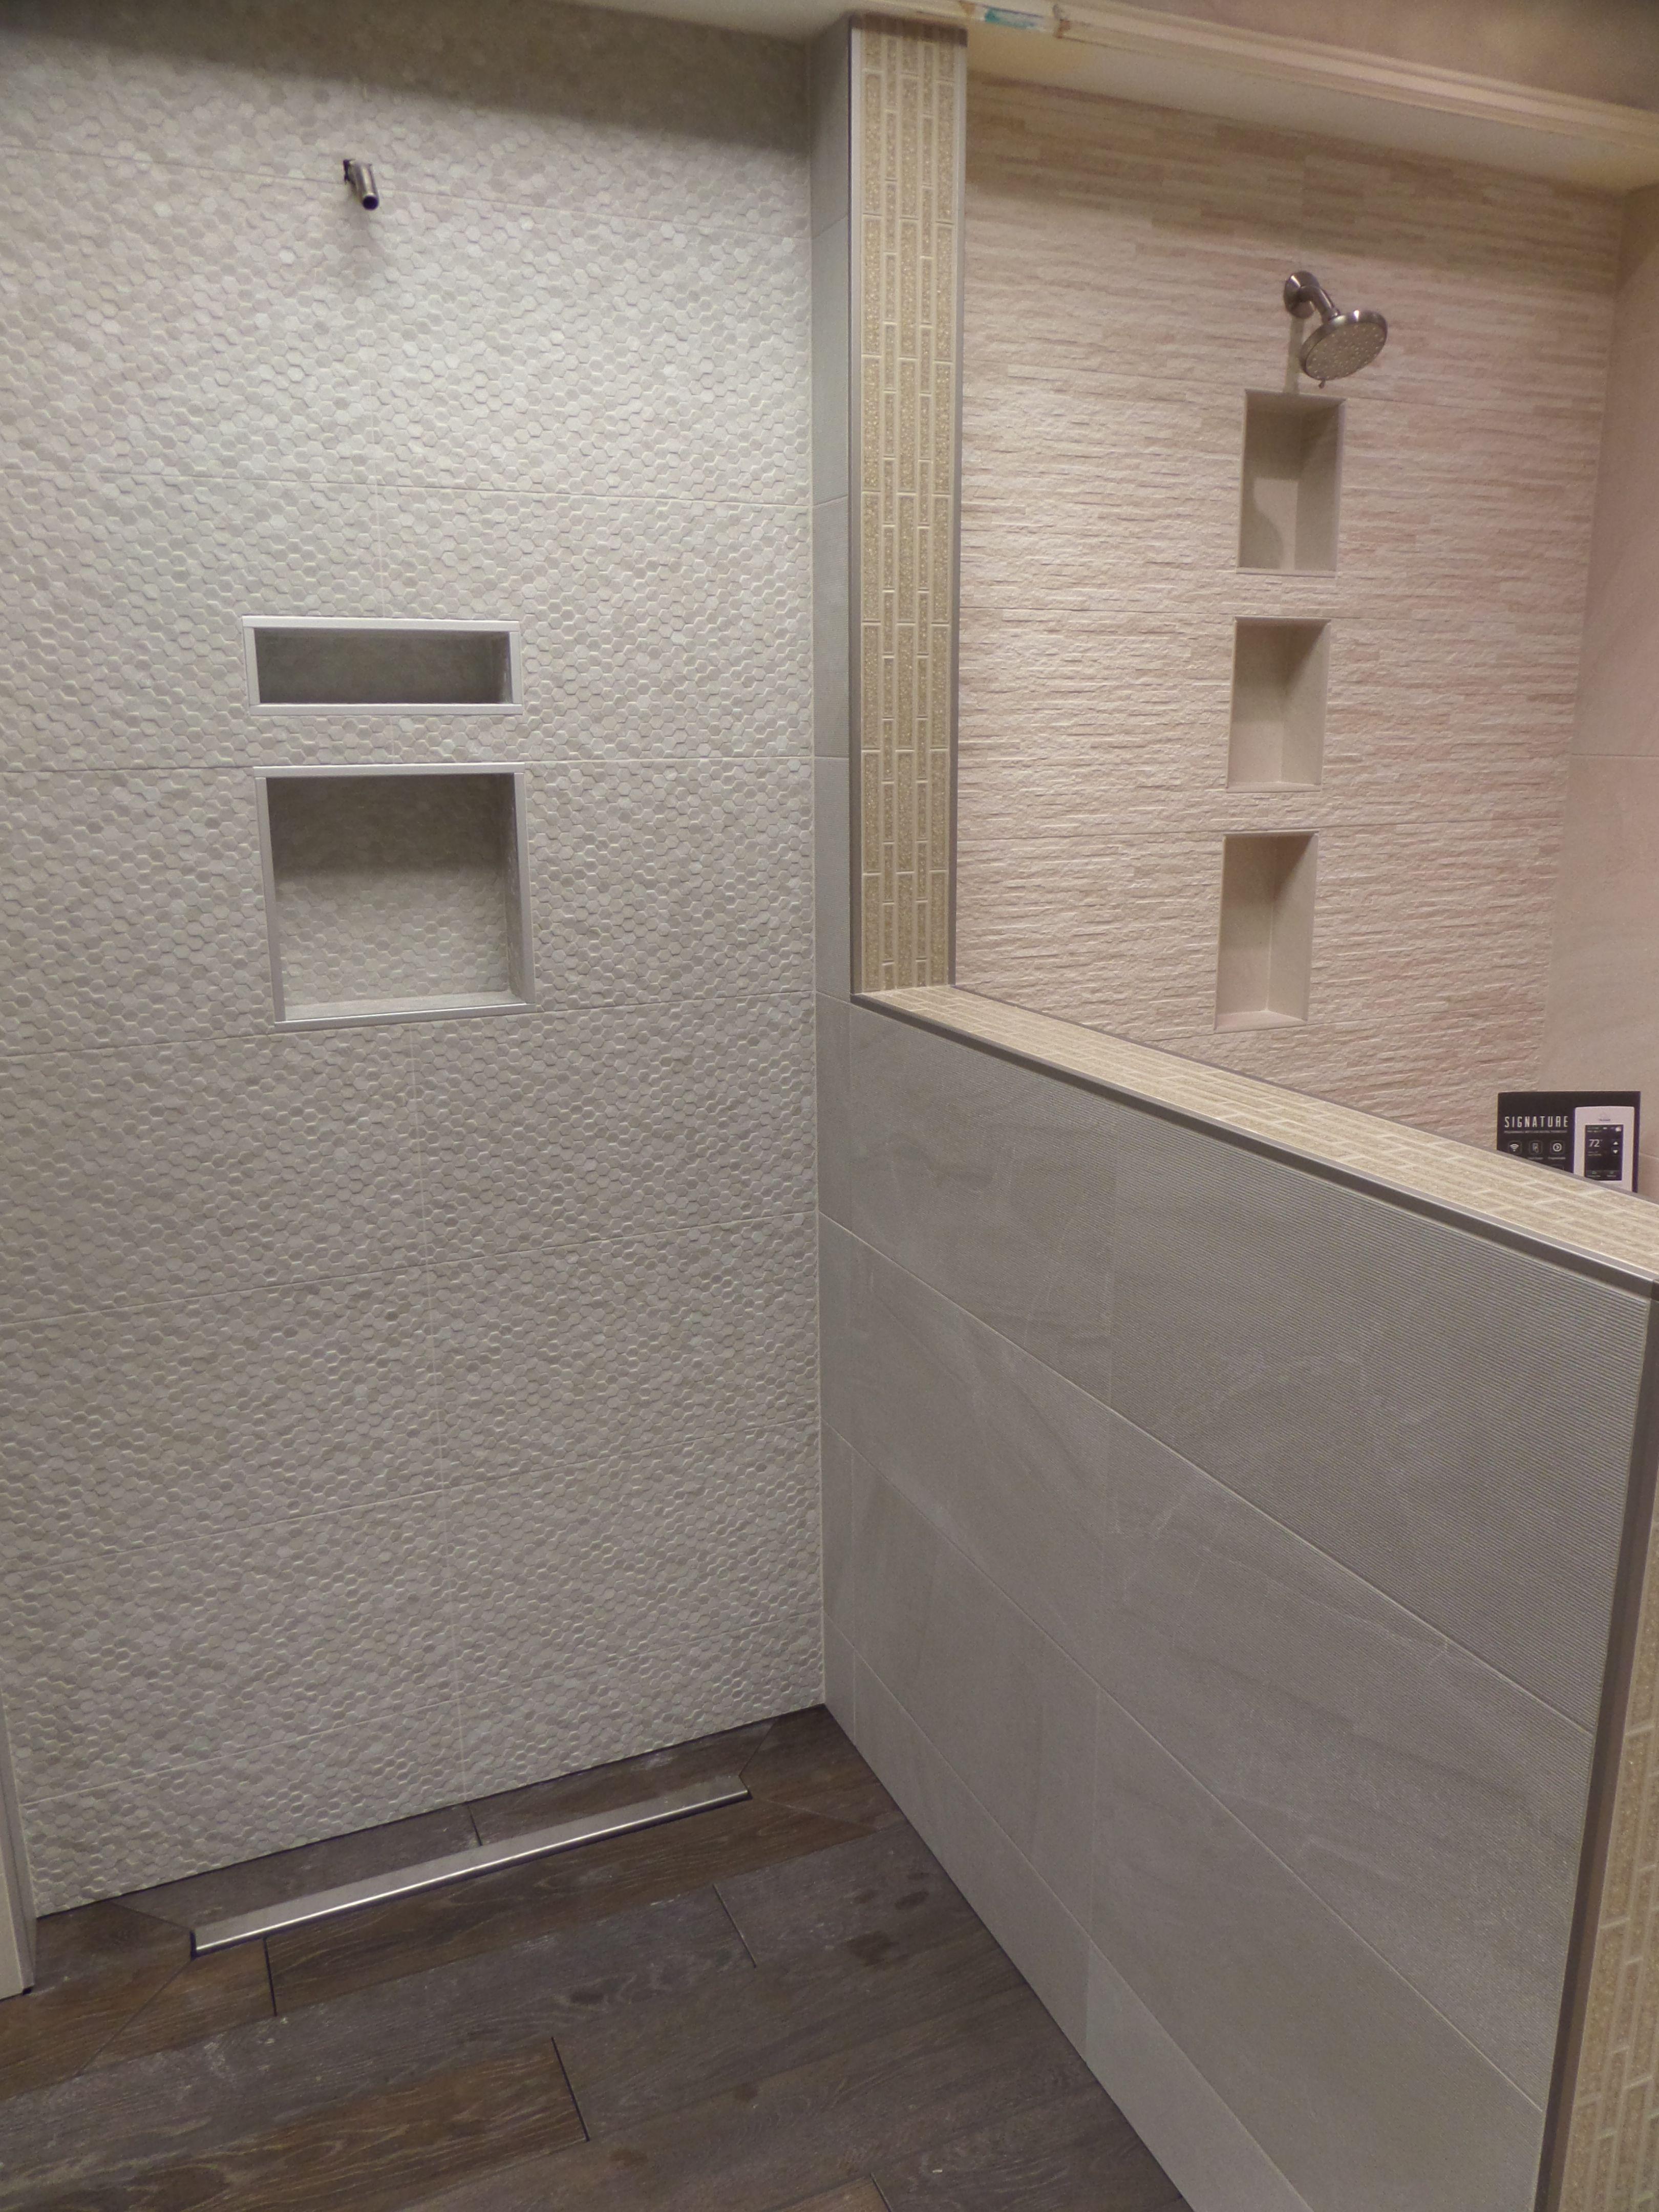 Shower Installation At MidAmericaTile ElkGroveVillage Piemme Purestone Geostone Blanke